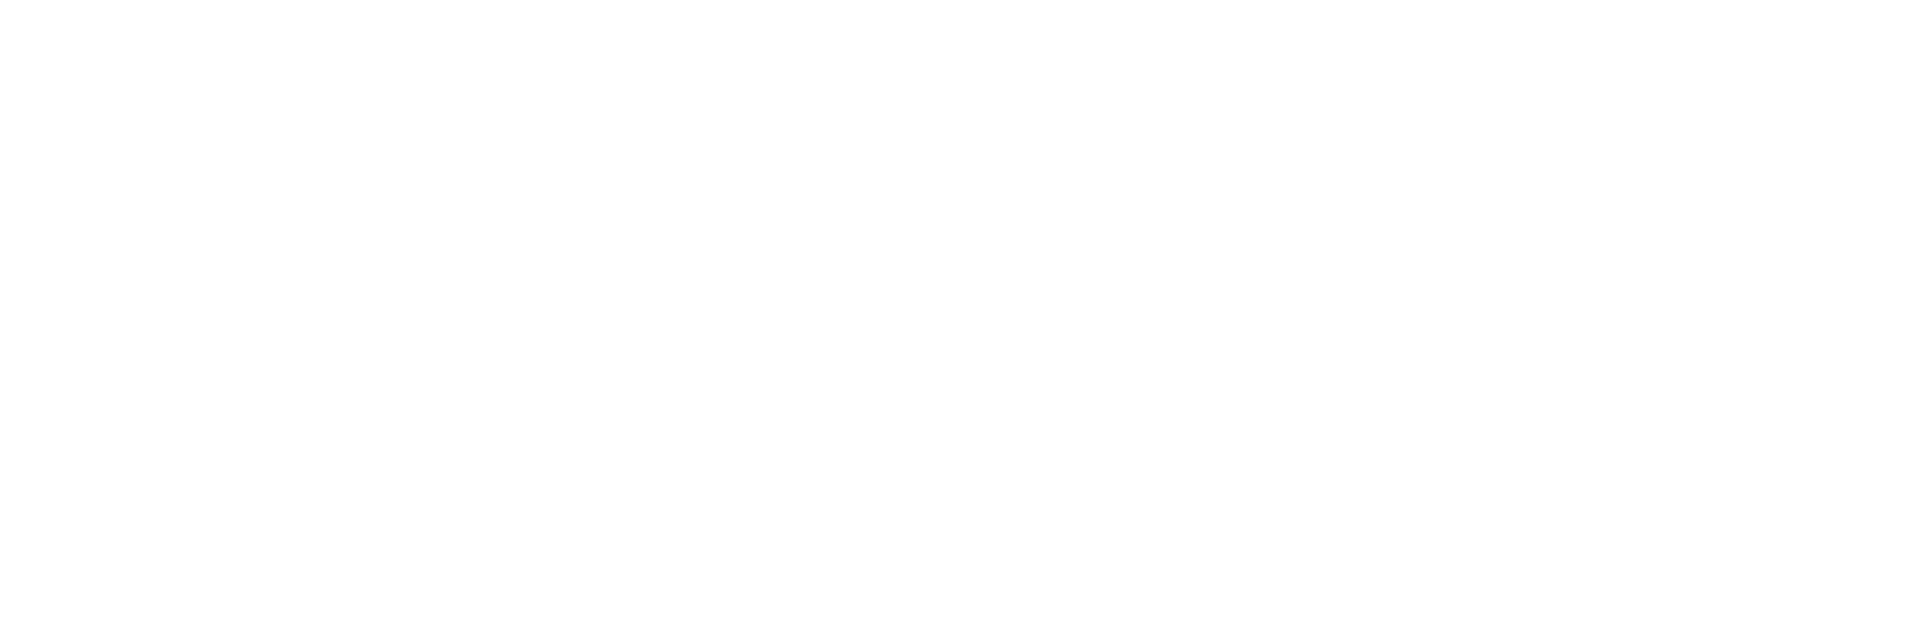 1920×640-filter-just-fact